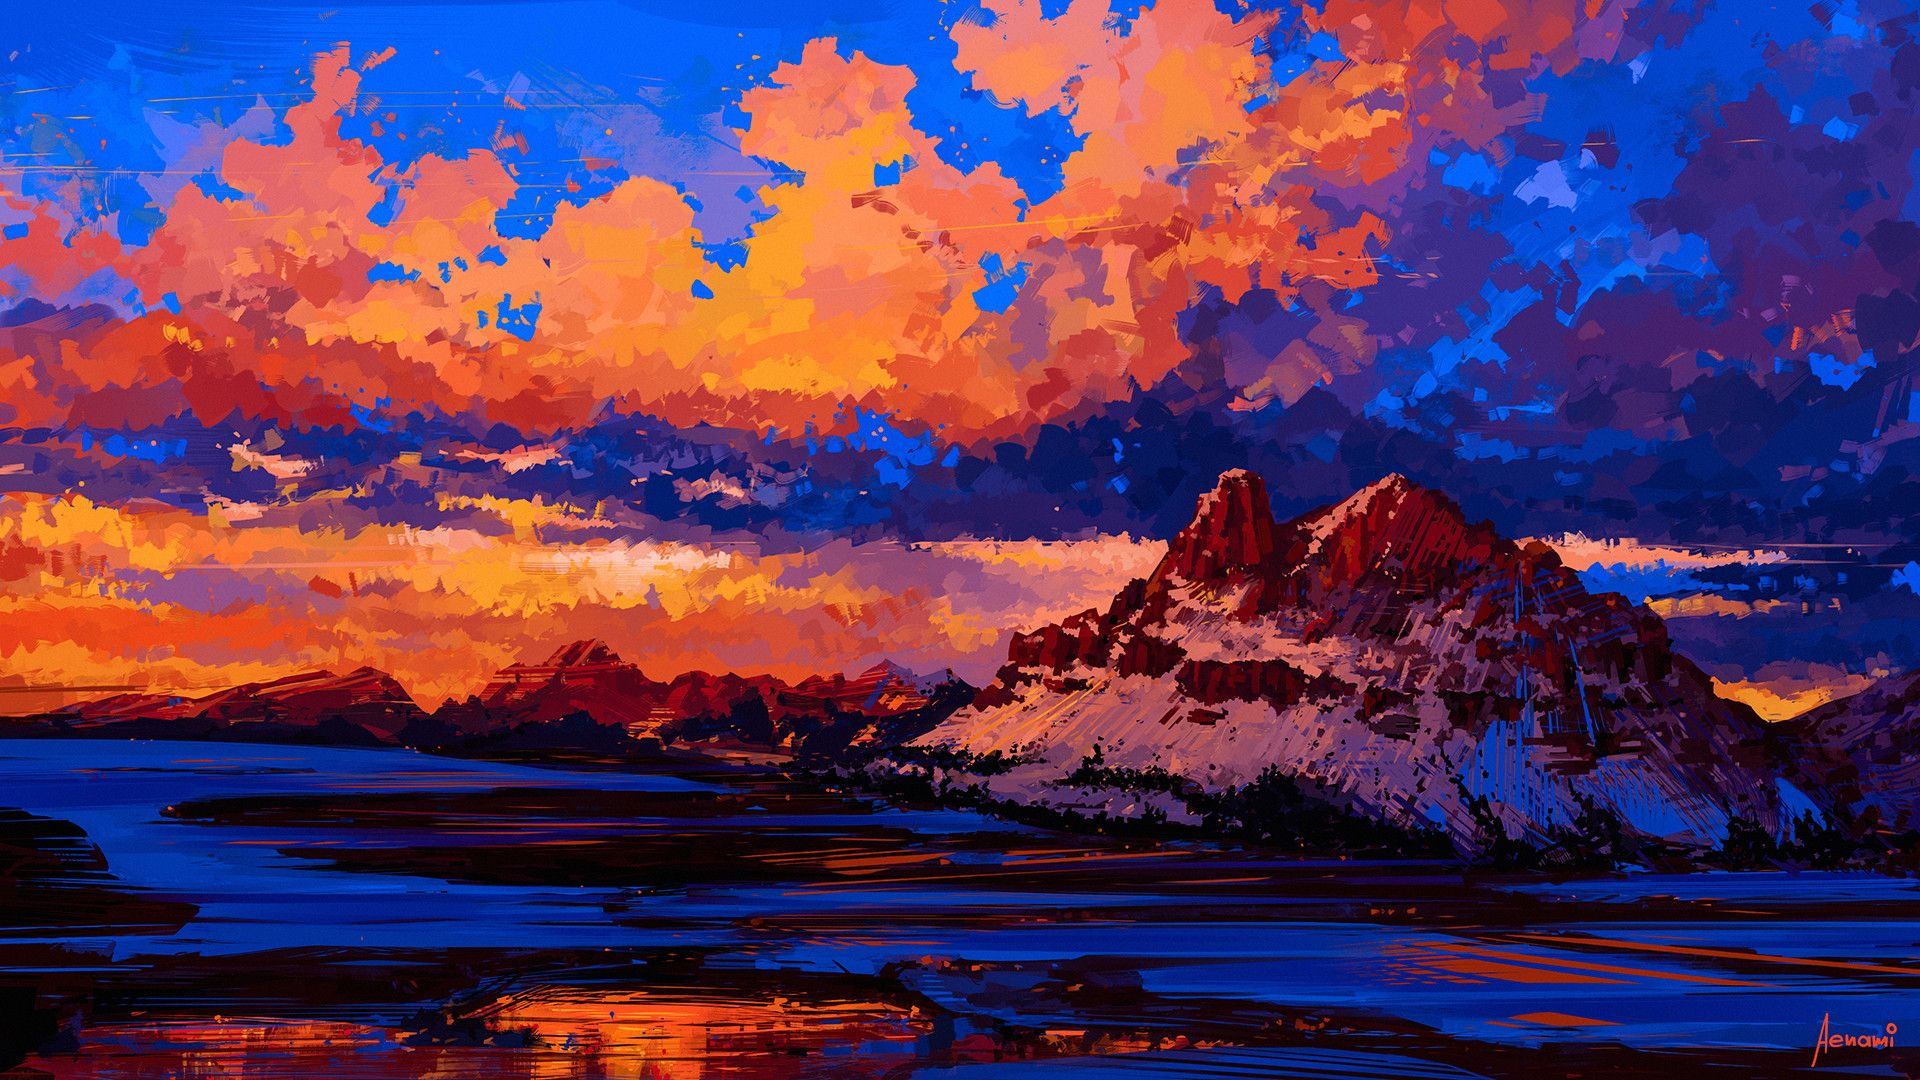 Mountain Sound (Alena Aenami) [1920 x 1080] Искусство